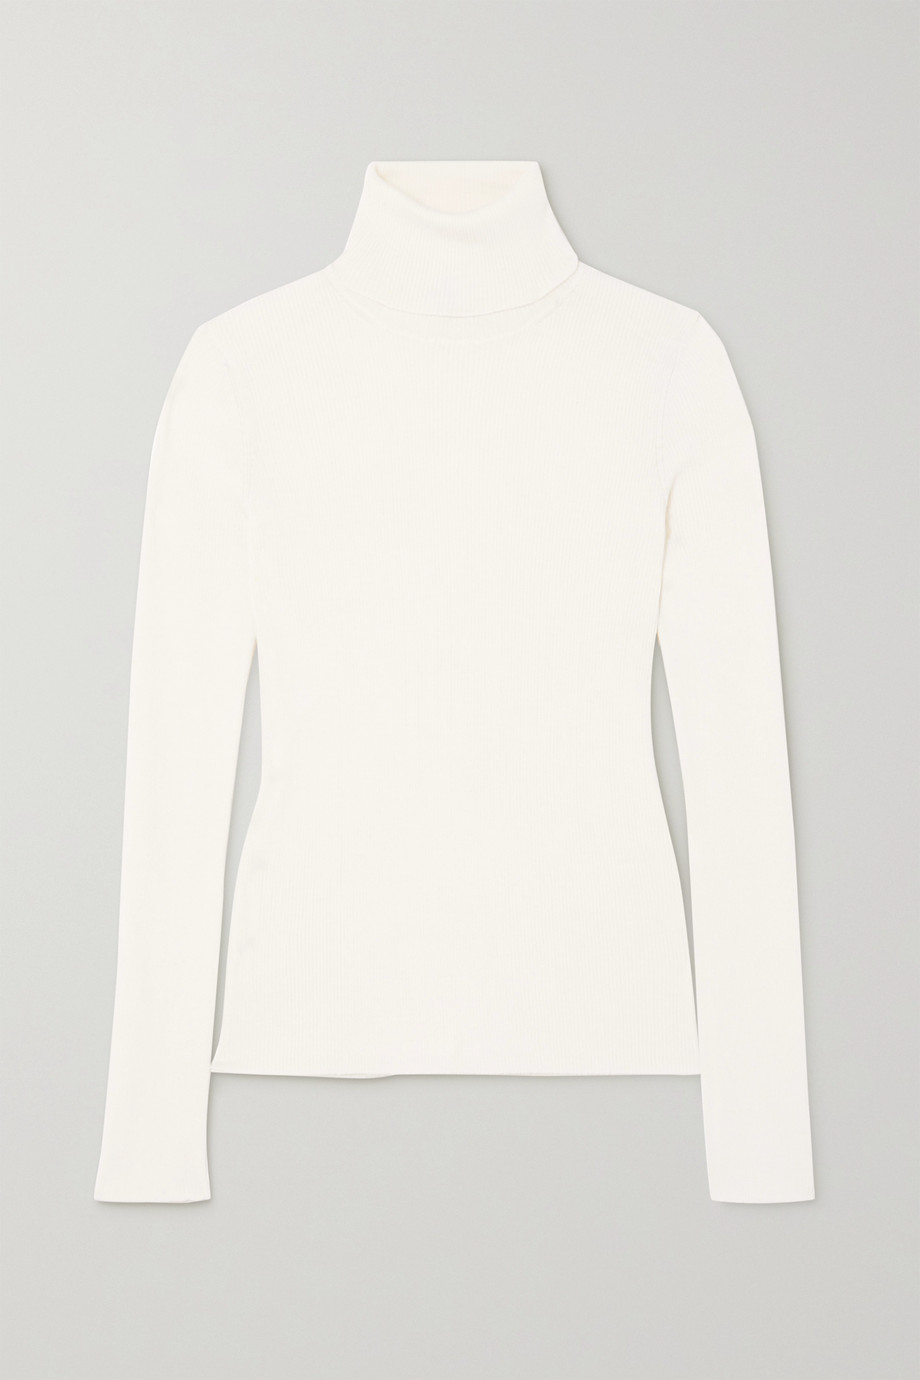 Salvatore Ferragamo Cashmere, wool and silk-blend turtleneck sweater